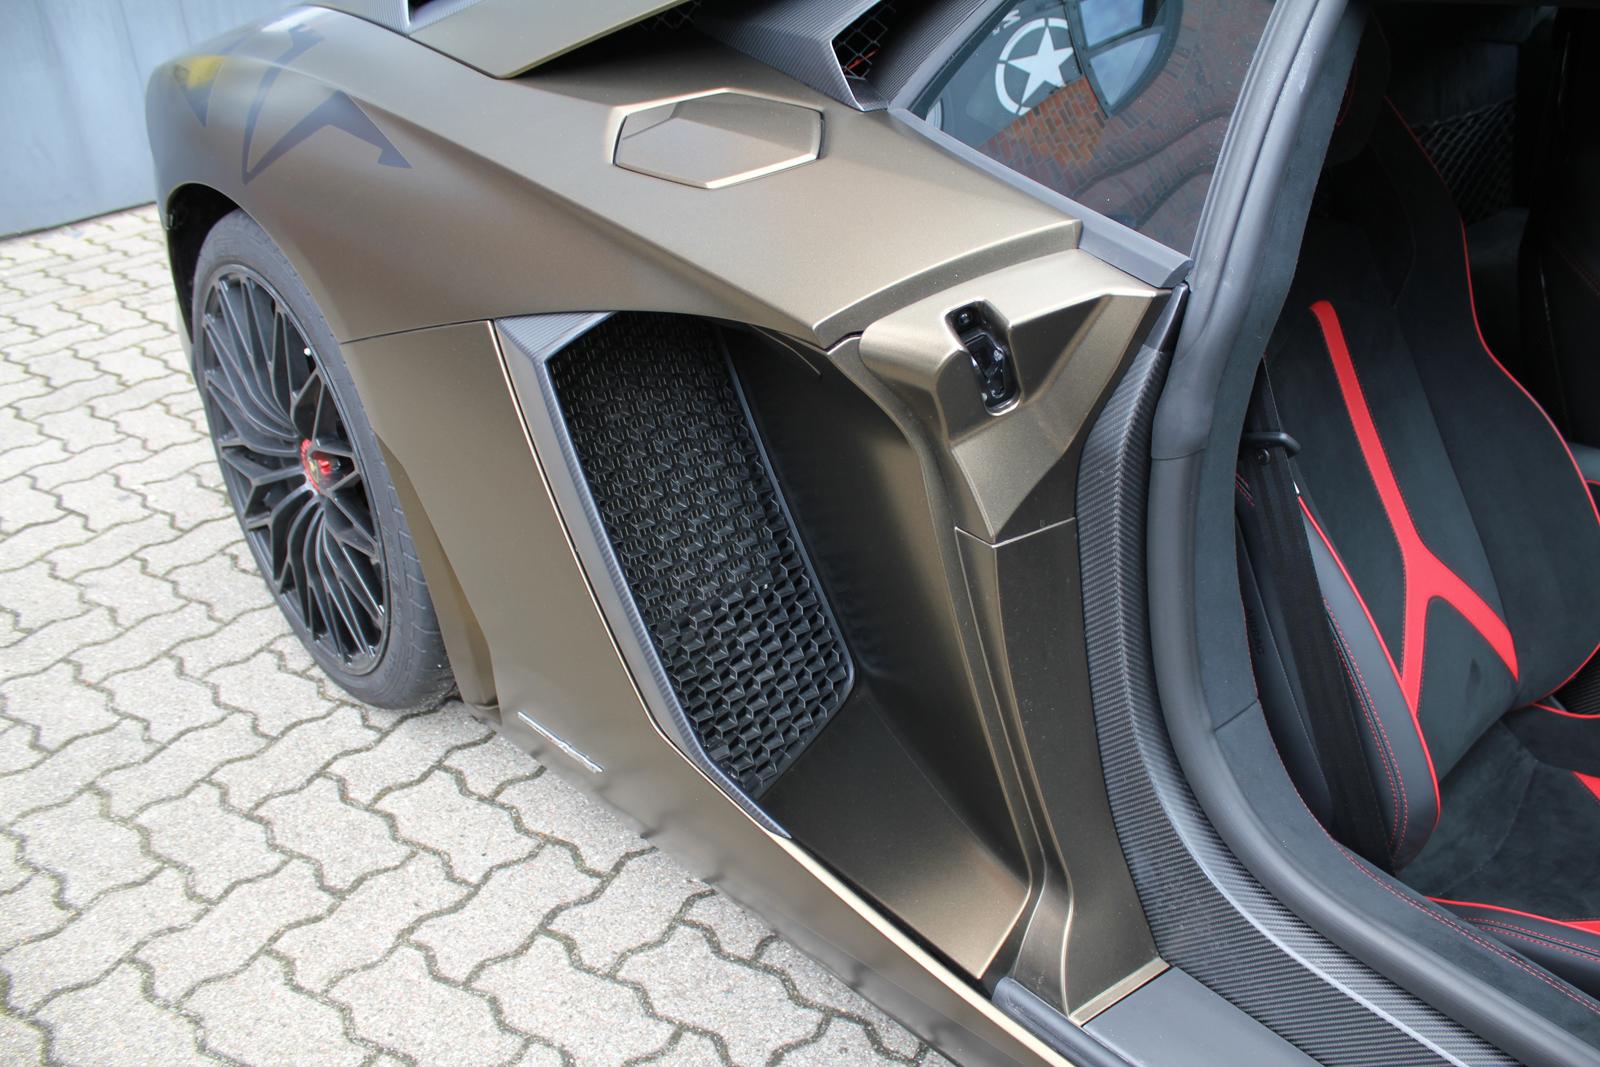 LAMBORGHINI_AVENTADOR_SV_CAR-WRAPPING_BOND_GOLD_05